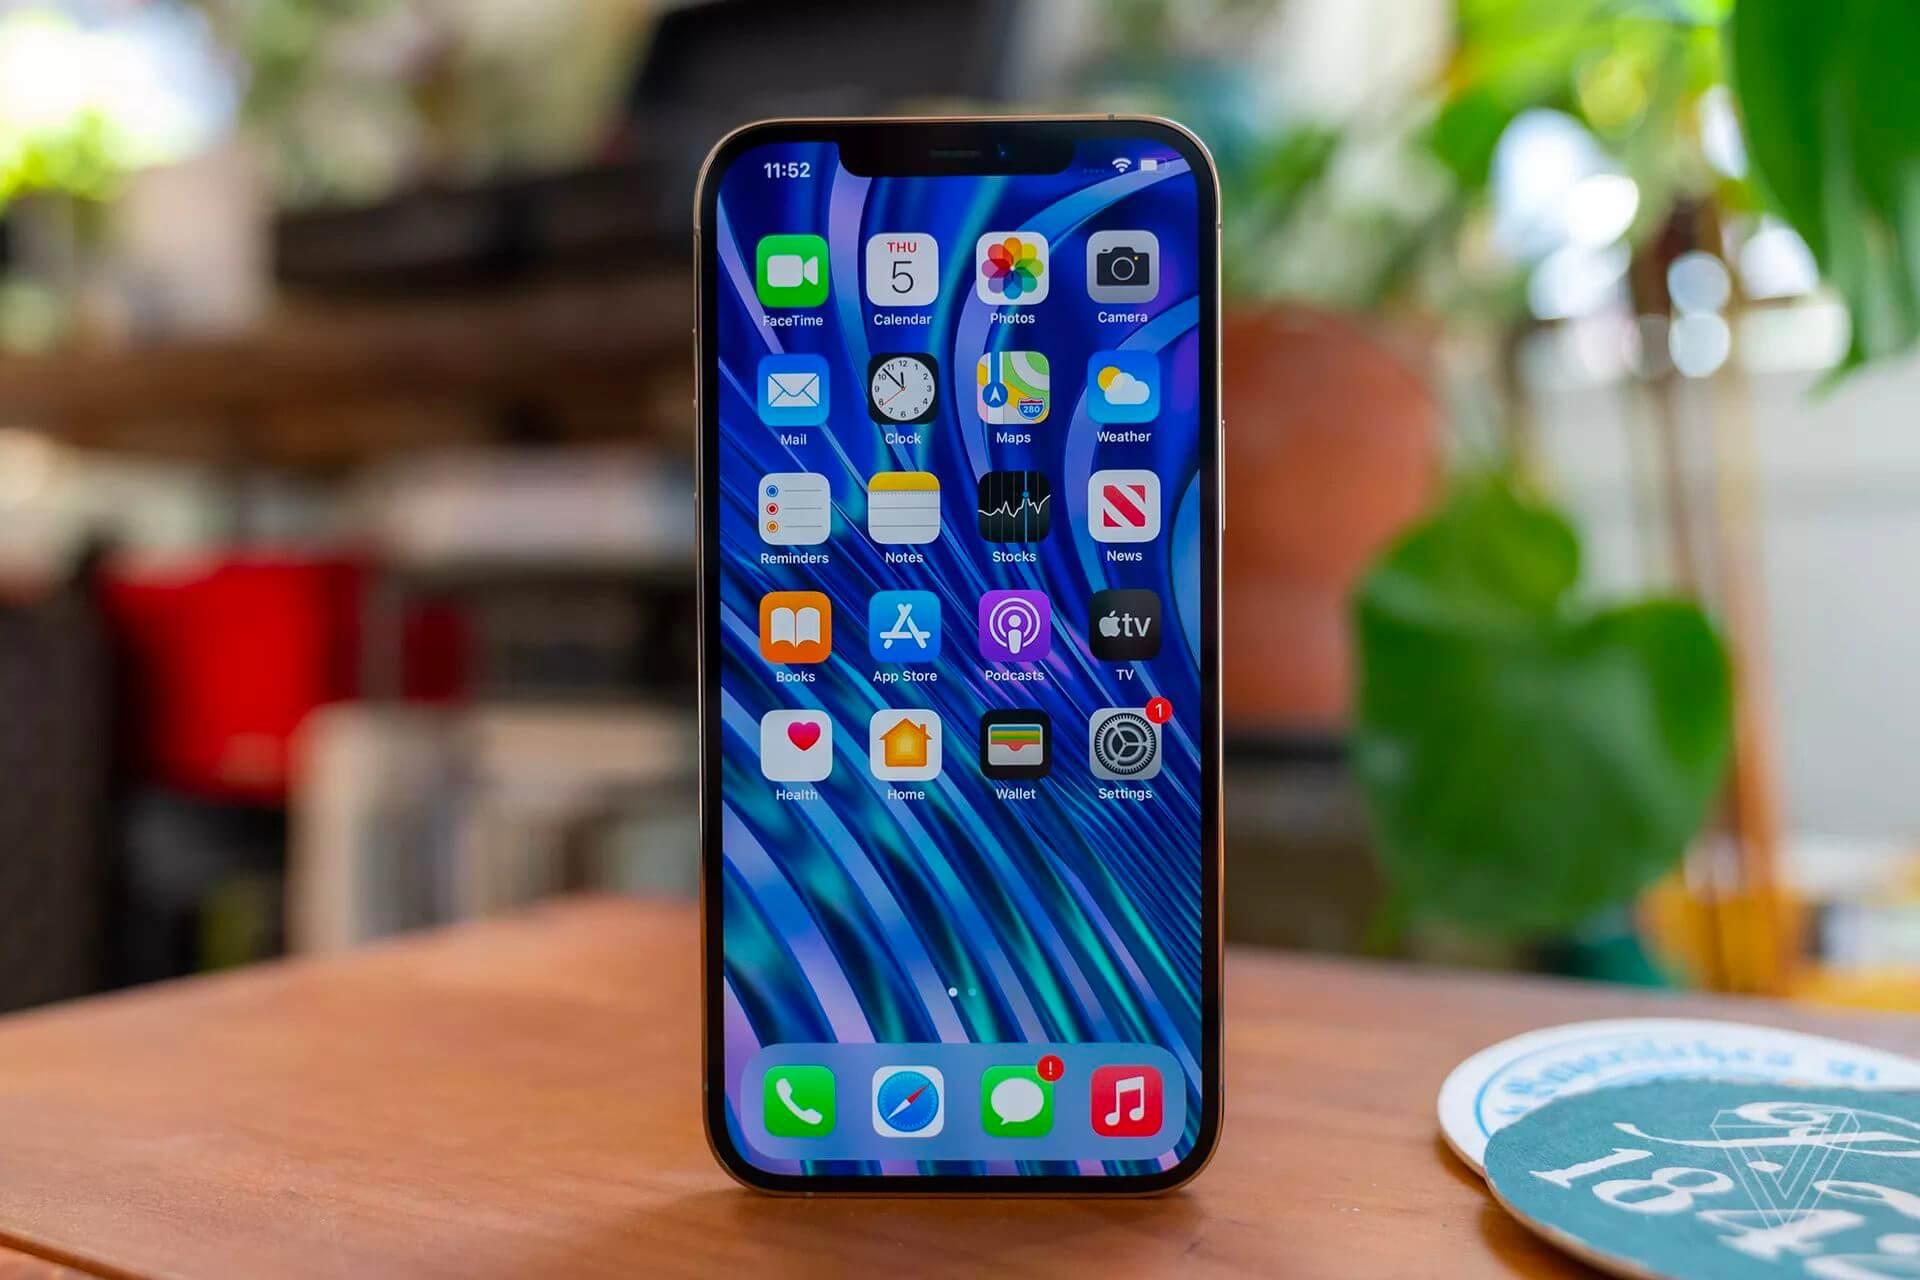 iphone 12 pro max developers smartphone